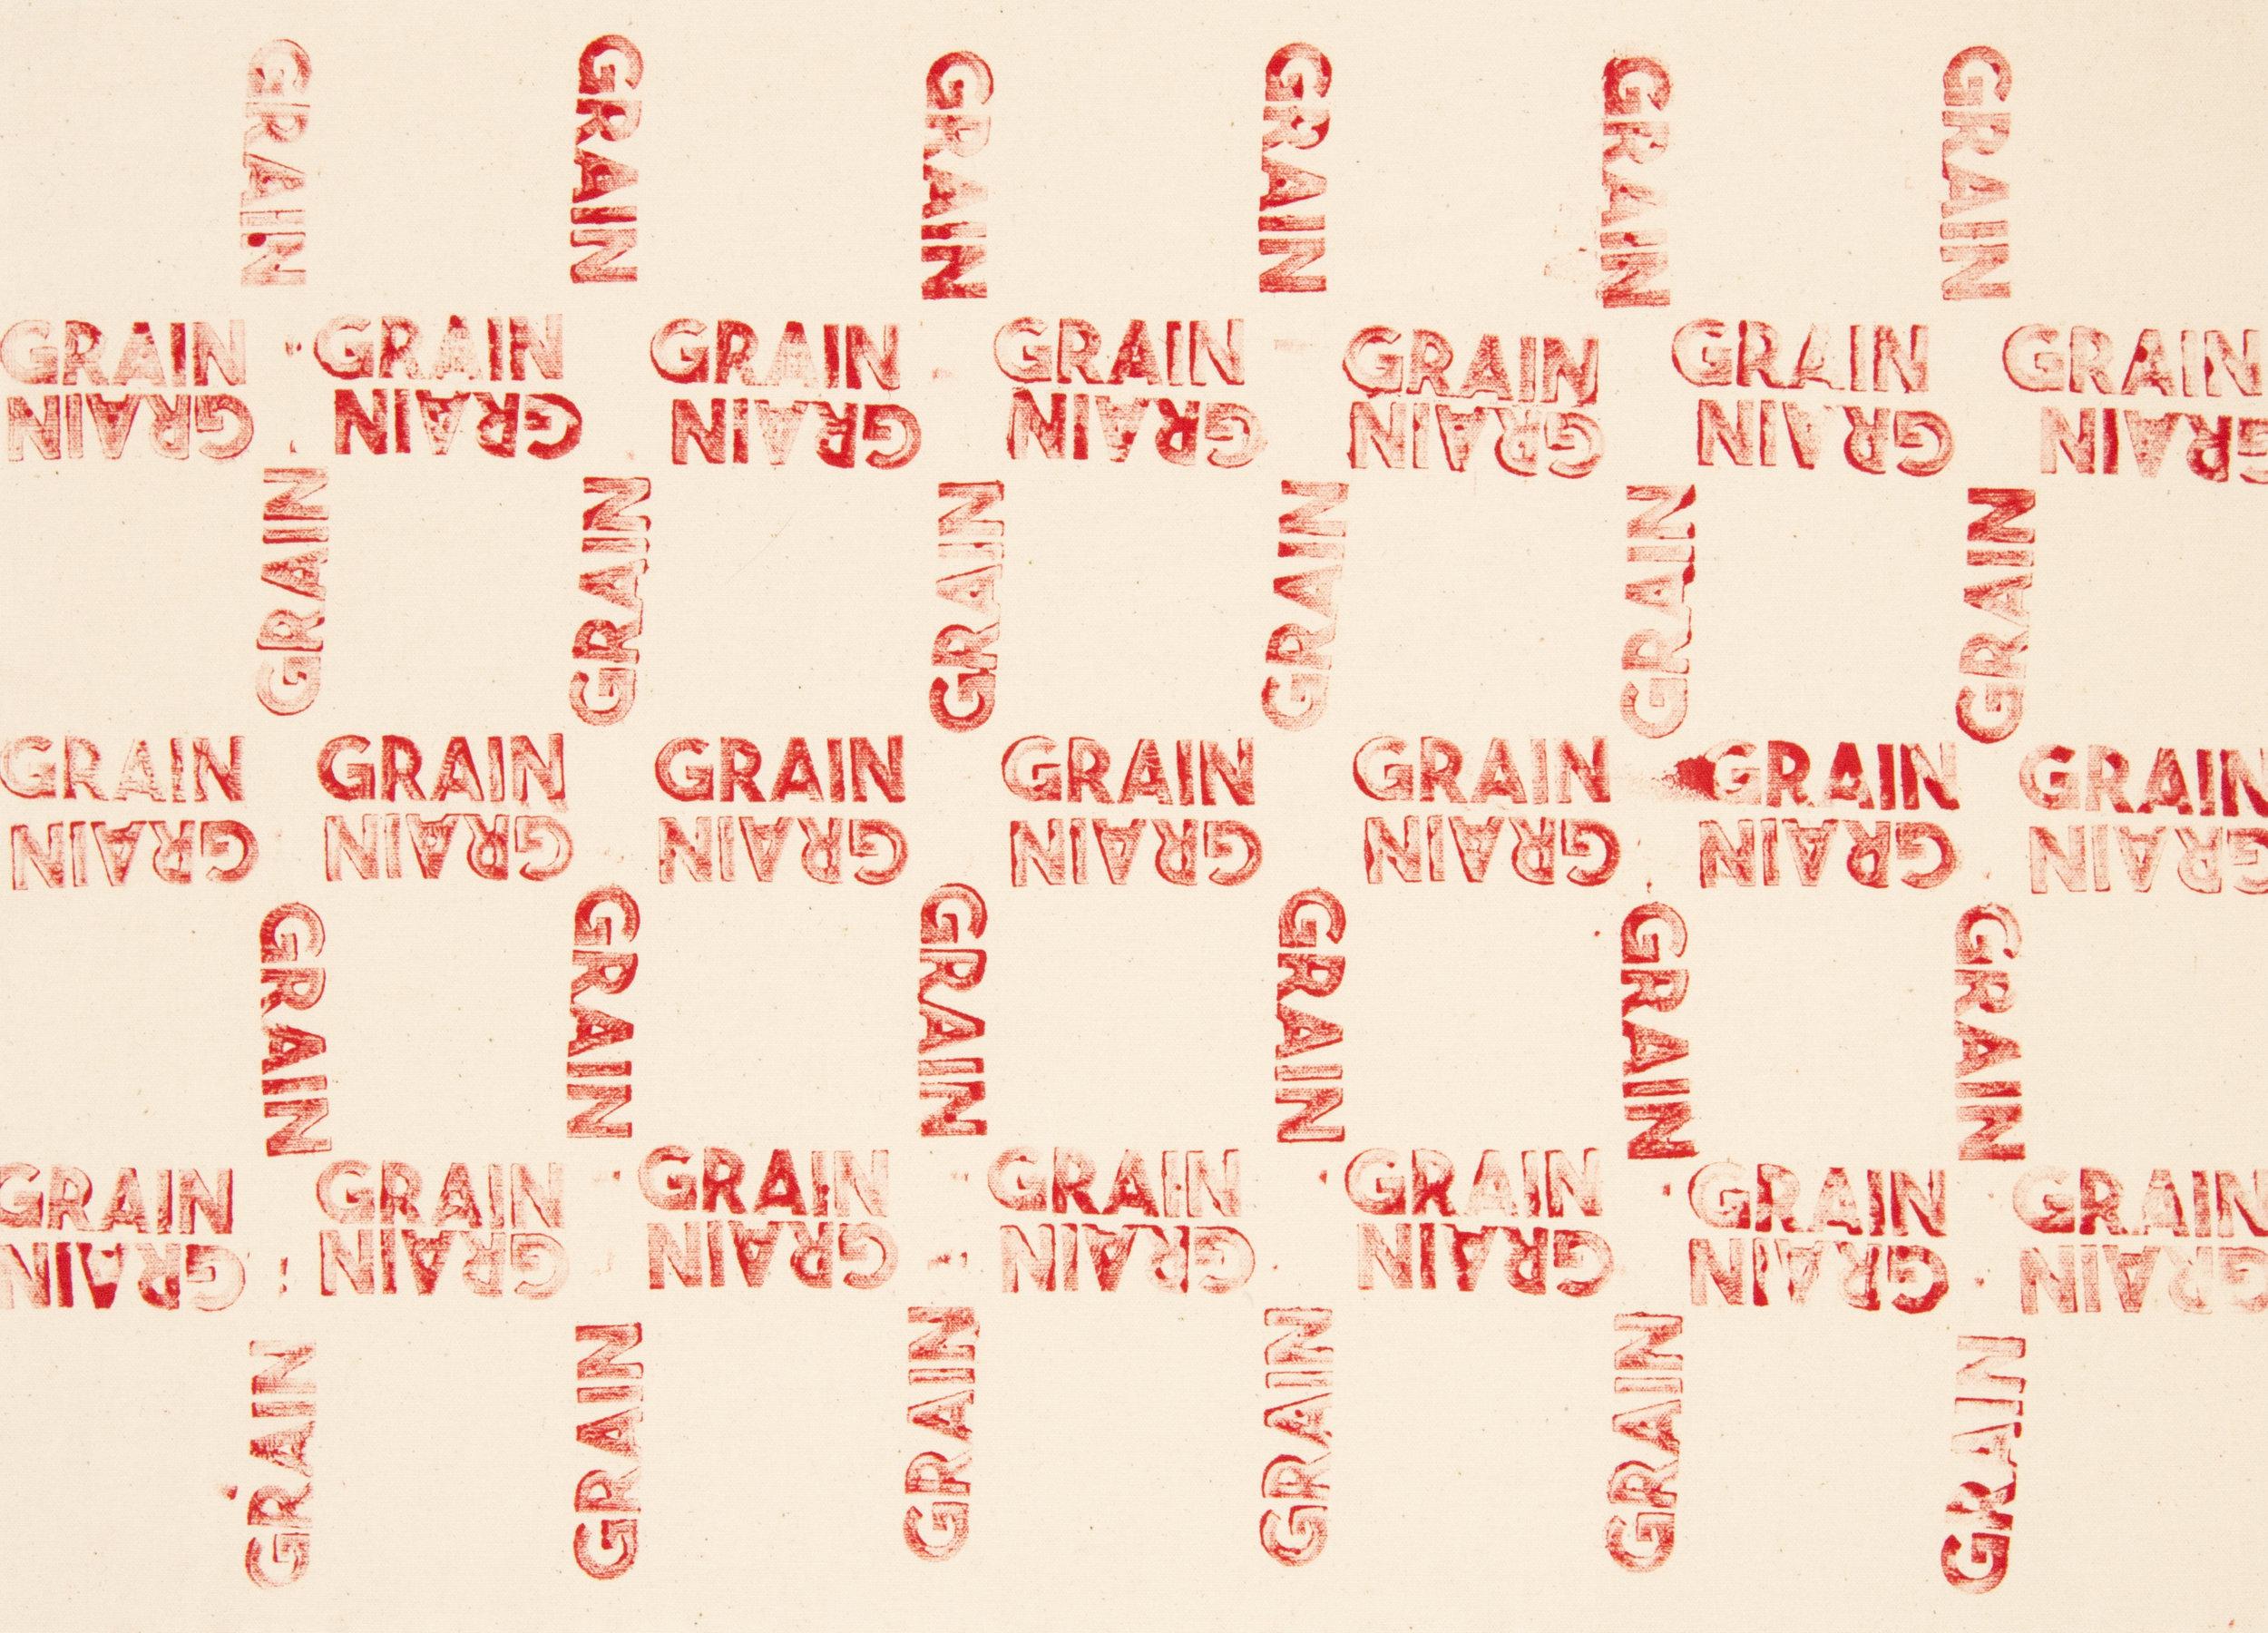 Grain copy.jpg